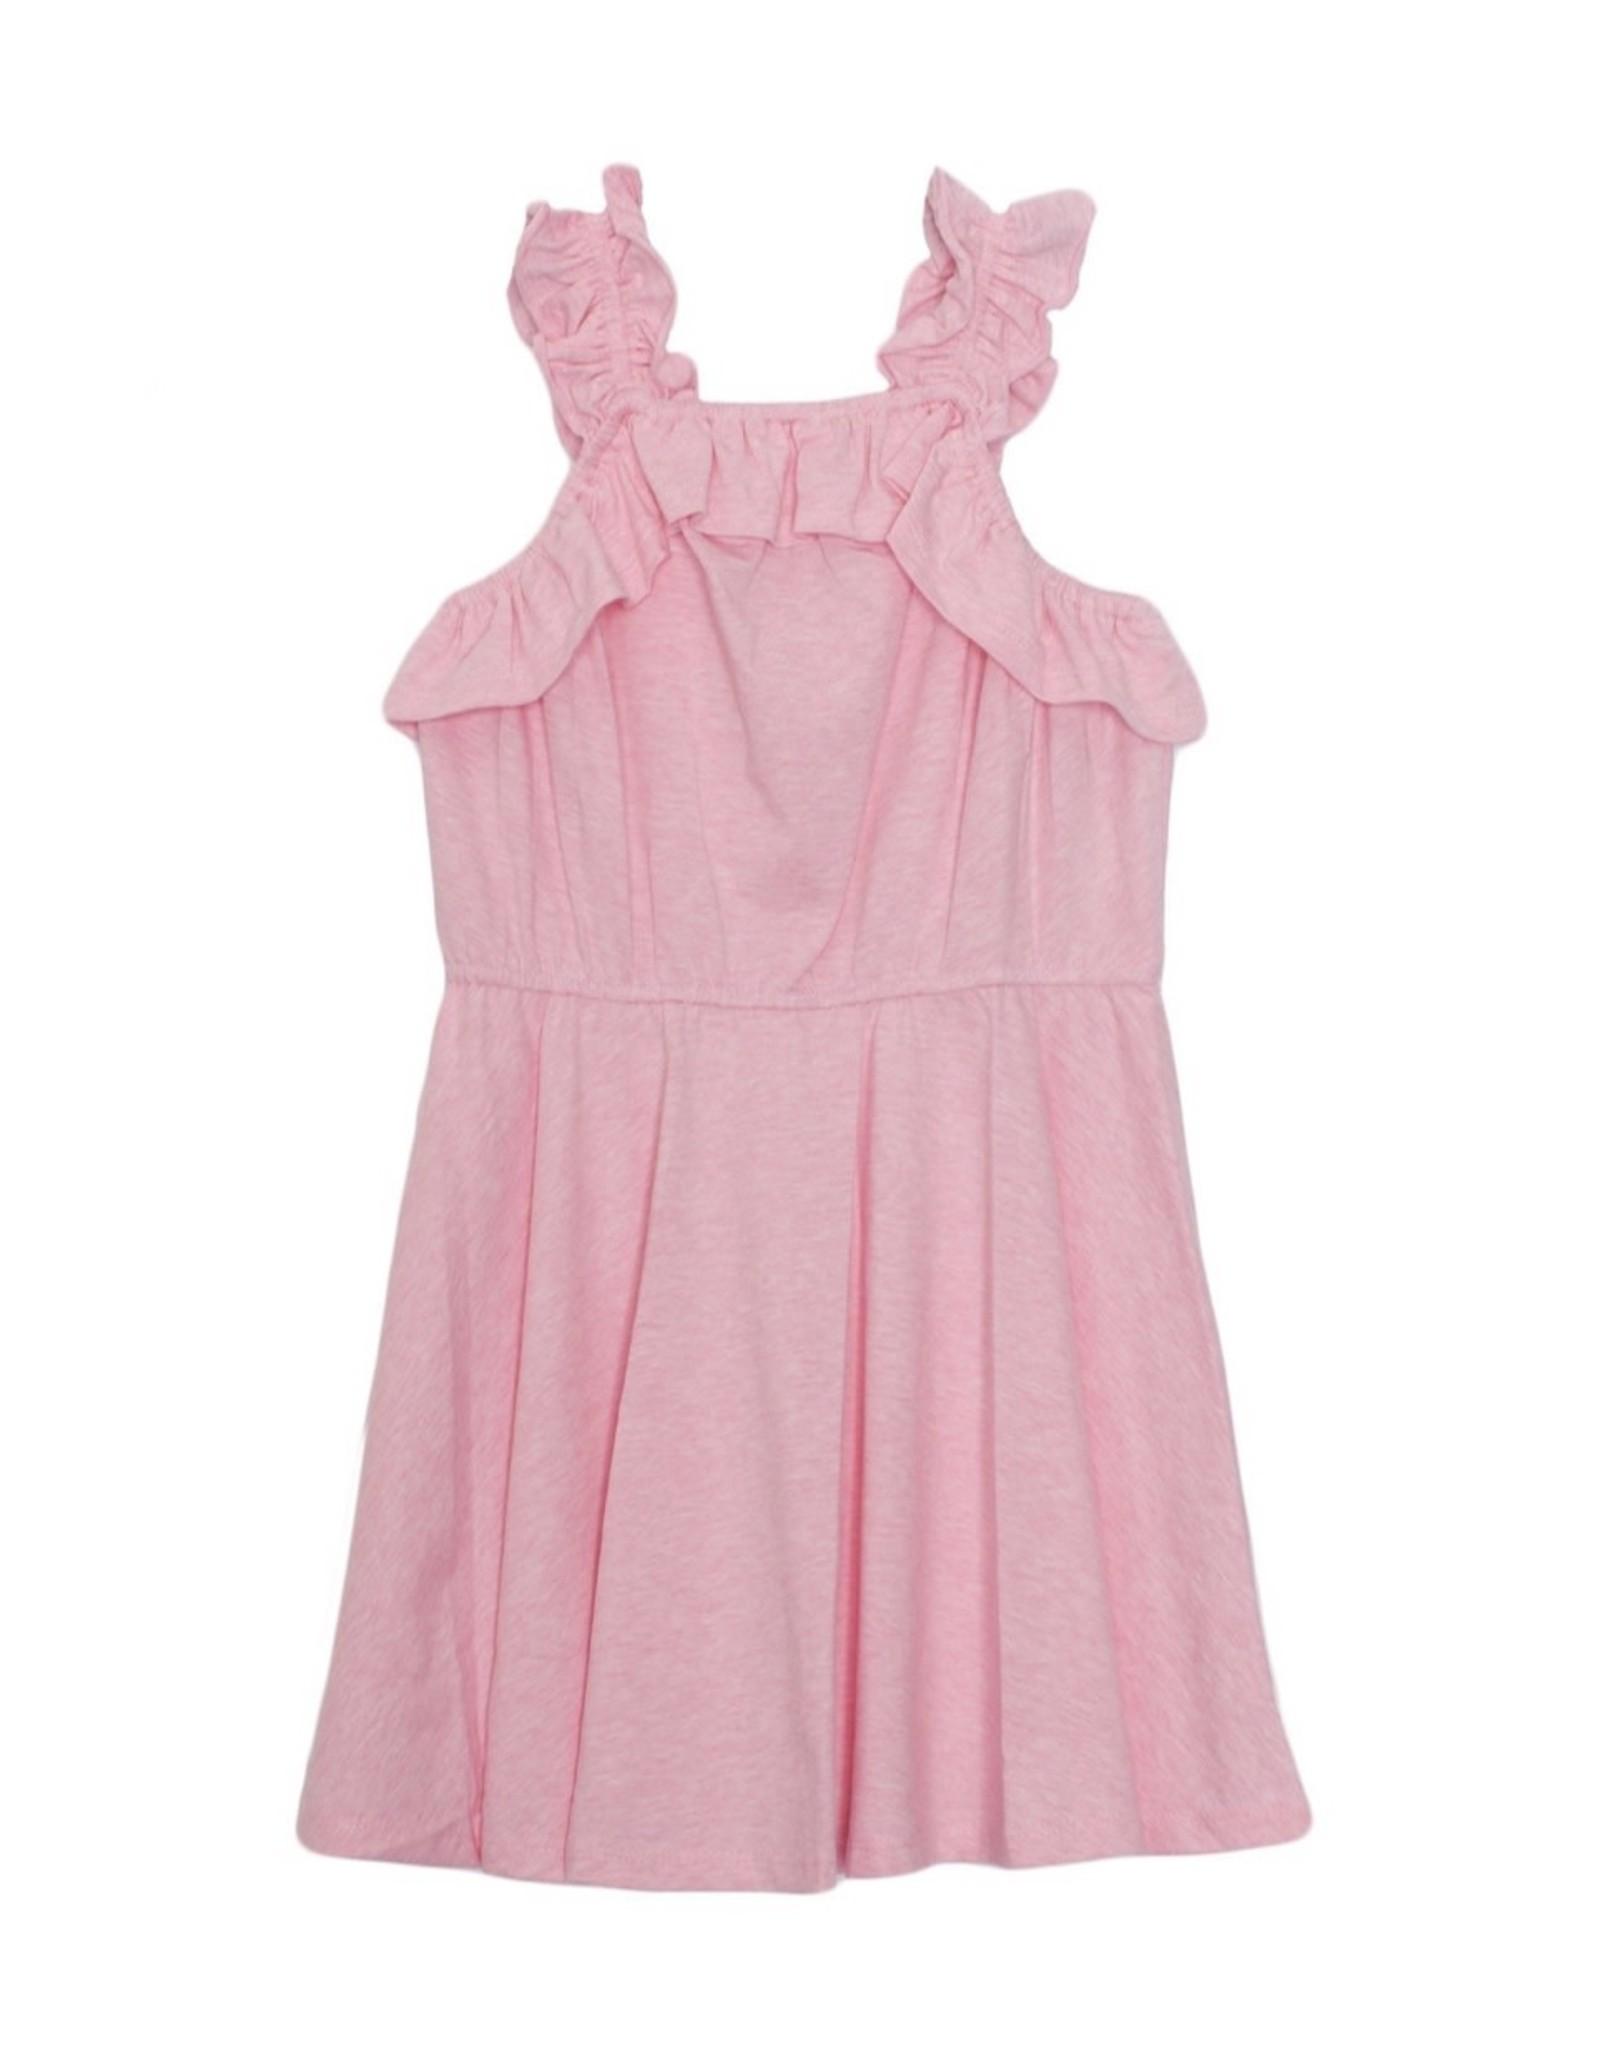 Isobella & Chloe Isobella & Chloe- Pink Knit Ruffle Dress